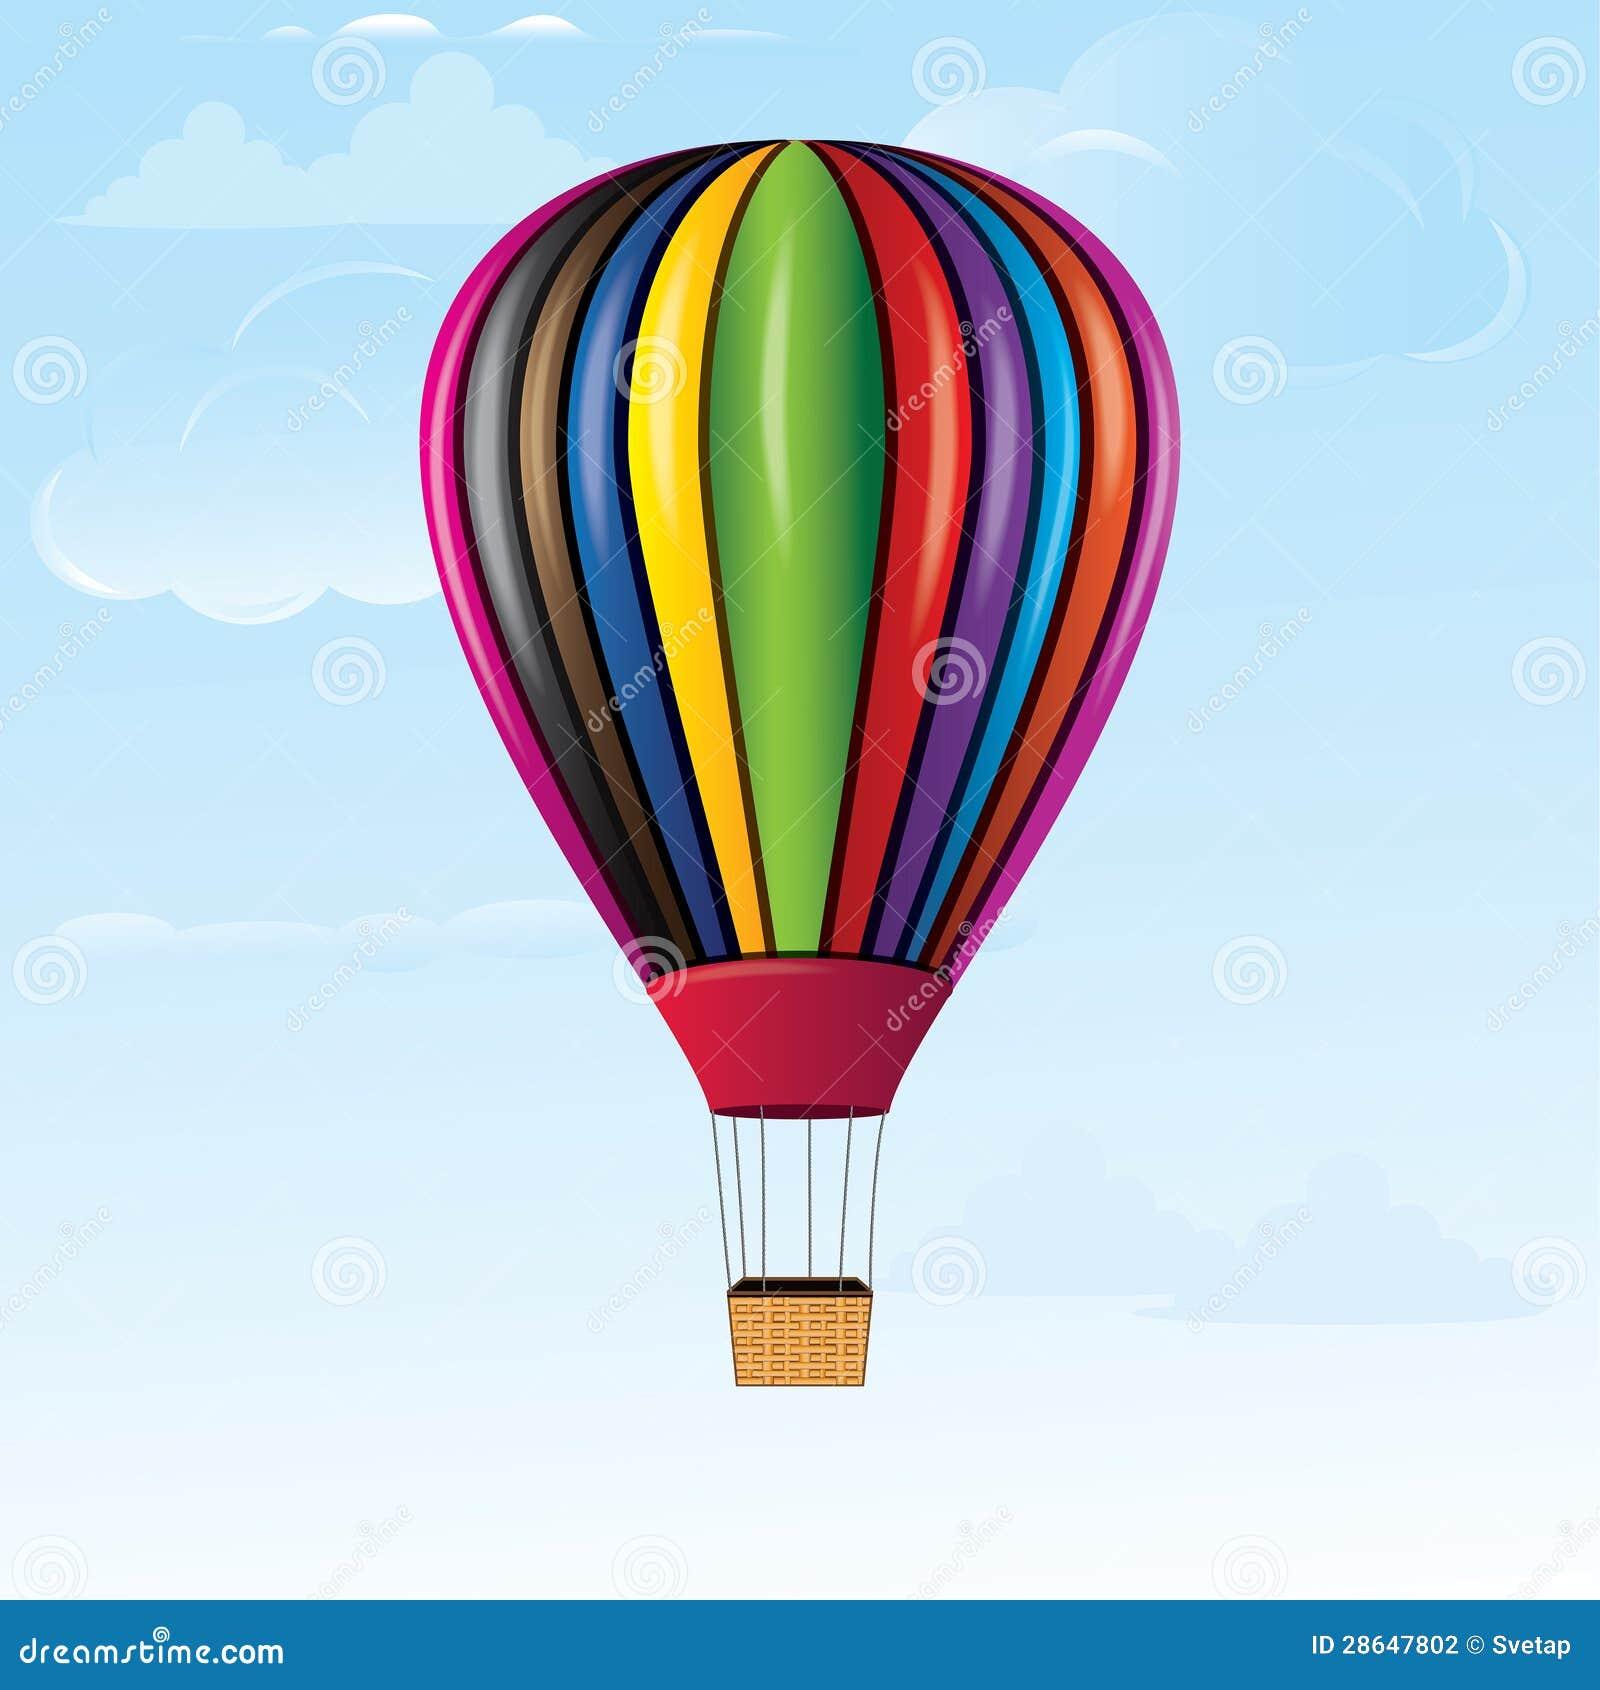 Hot Air Balloon Stock Photography - Image: 28647802